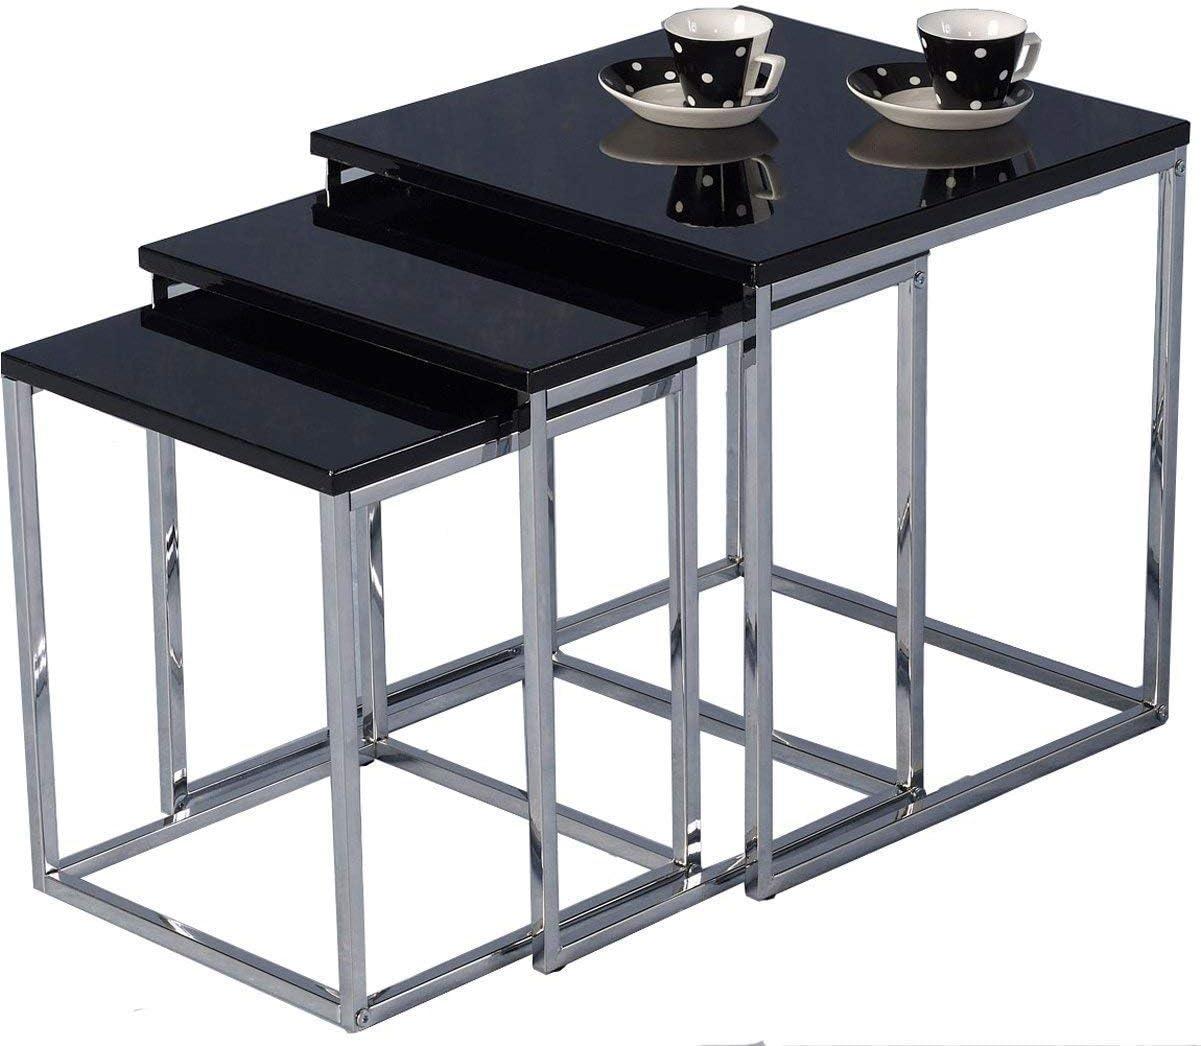 Nieuwe Aankomst GWFVA Moderne 3 Nest of Table zwart hoogglans sets sofa salontafel woonkamermeubels sofa bijzettafel (zwart) zwart LveSBqn